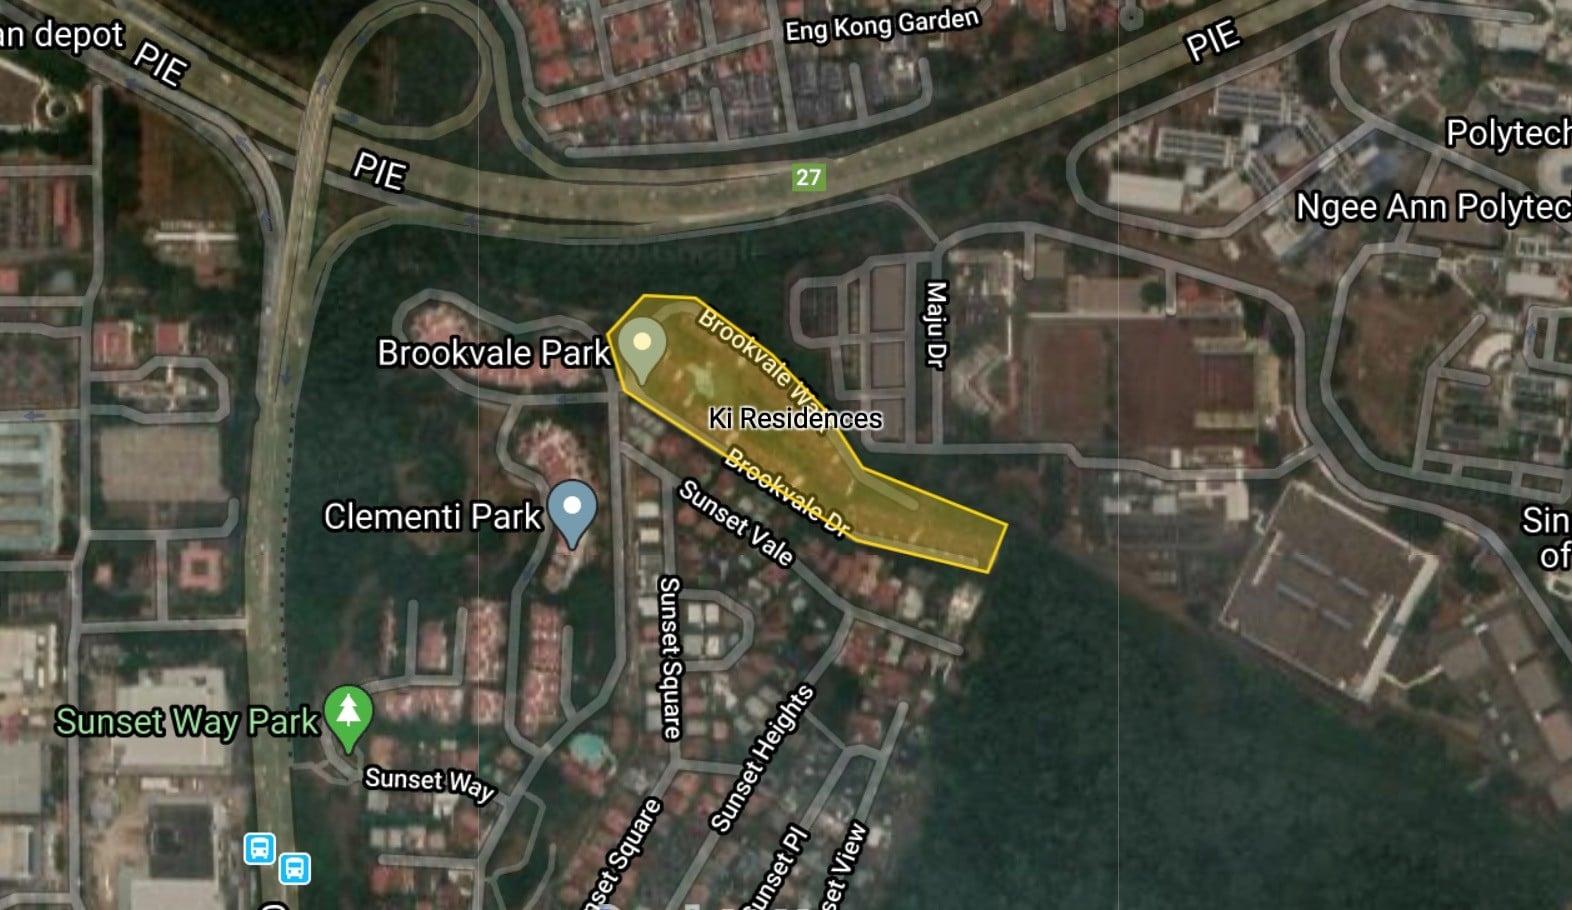 Ki Residences: New 999-Yrs Condo near Beuaty World & Clementi MRT